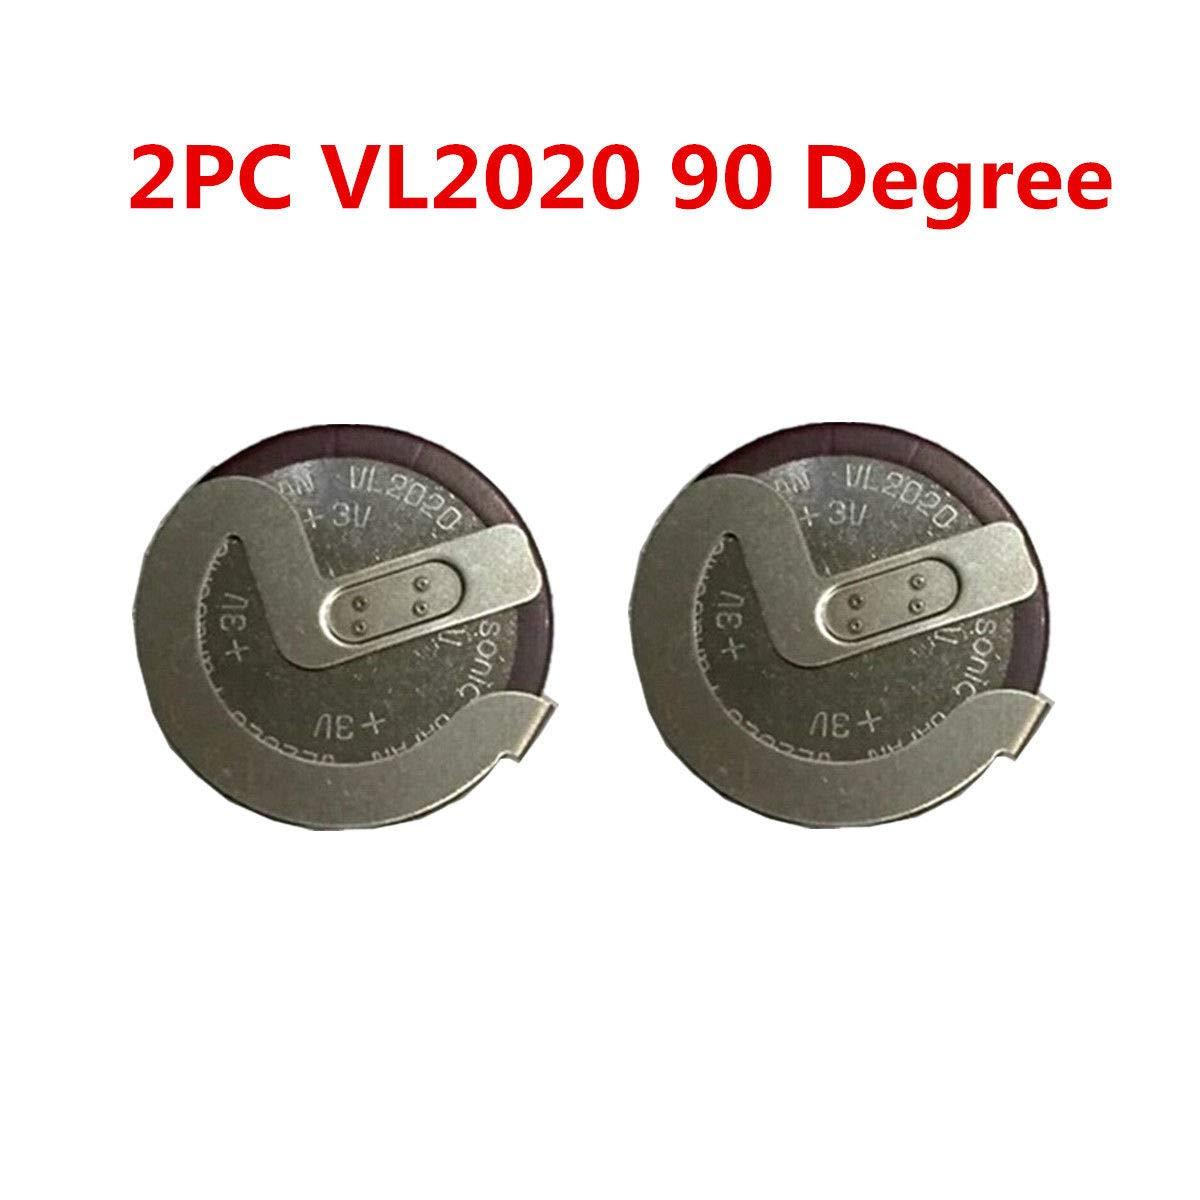 FidgetKute 2PCS VL2020 for BMW Key Case Shell Fob Rechargeable Button Battery 90° by FidgetKute